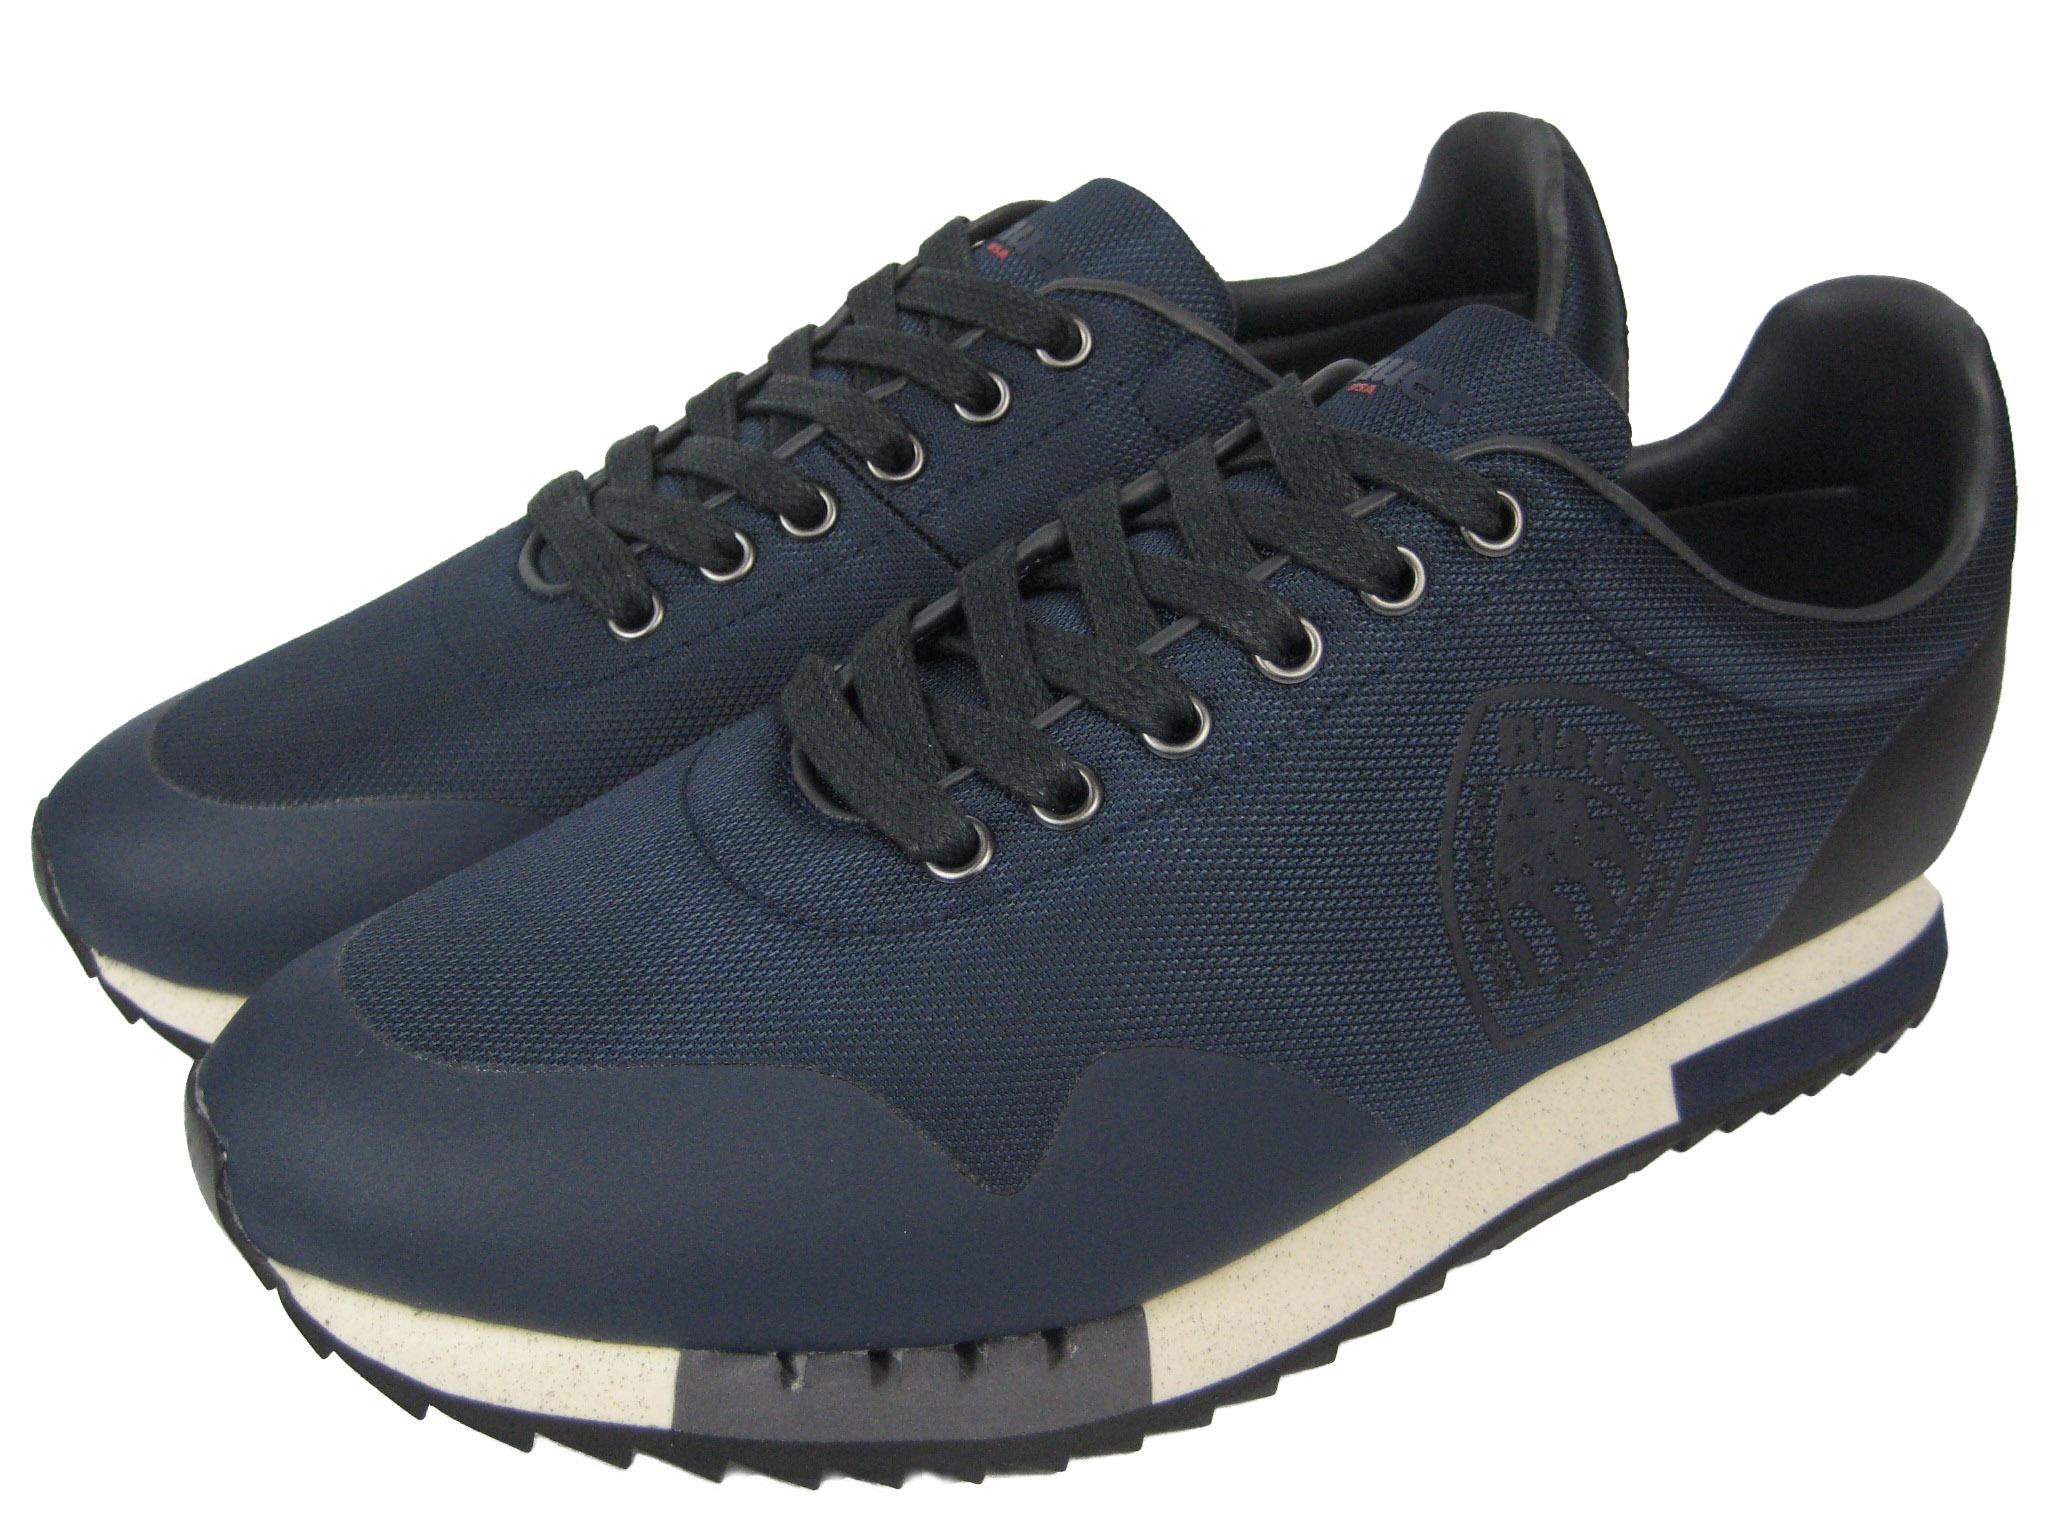 new product 8edd1 41a77 Blauer USA Herren Sneaker Schuhe Detroit dunkel blau navy